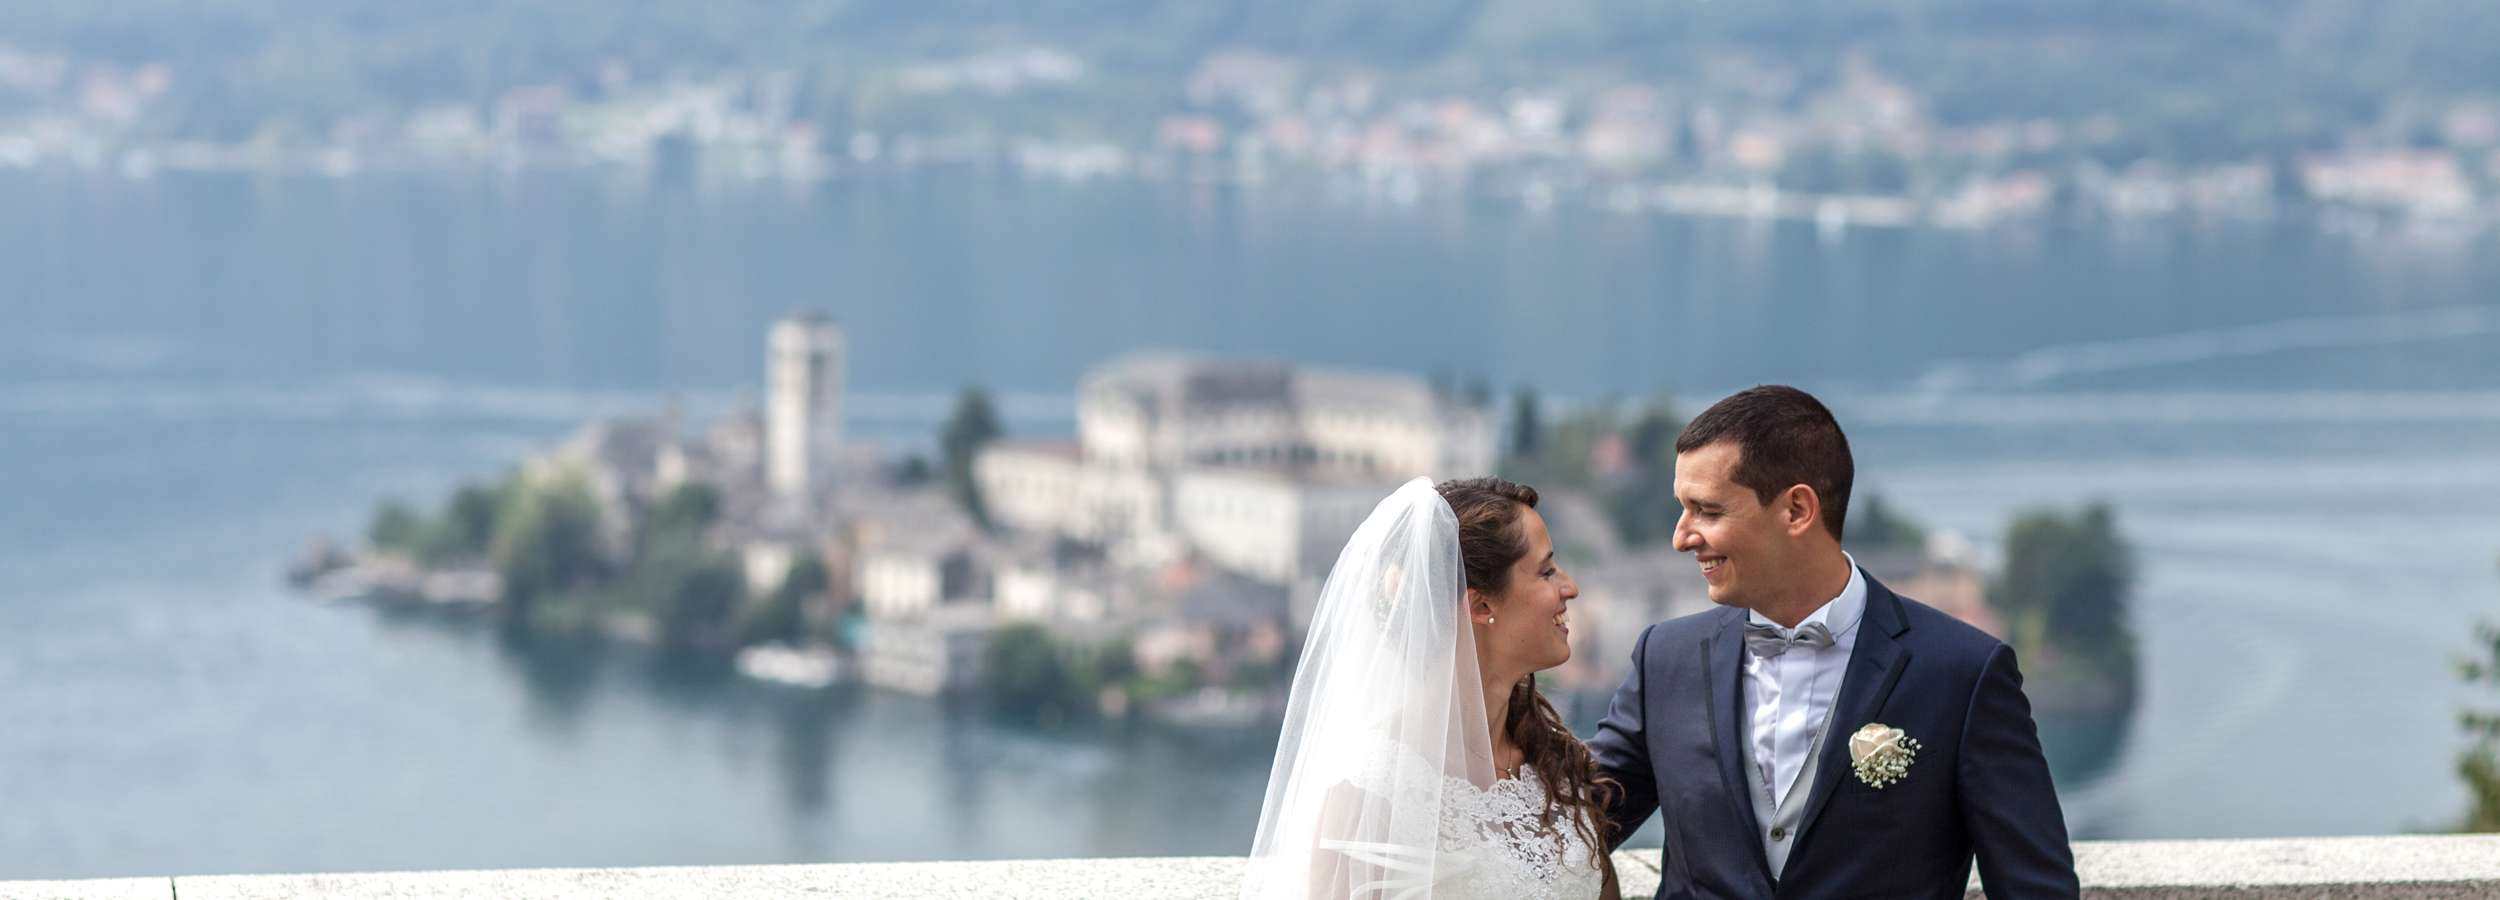 Matrimonio a Orta San Giulio (Lago d'Orta)